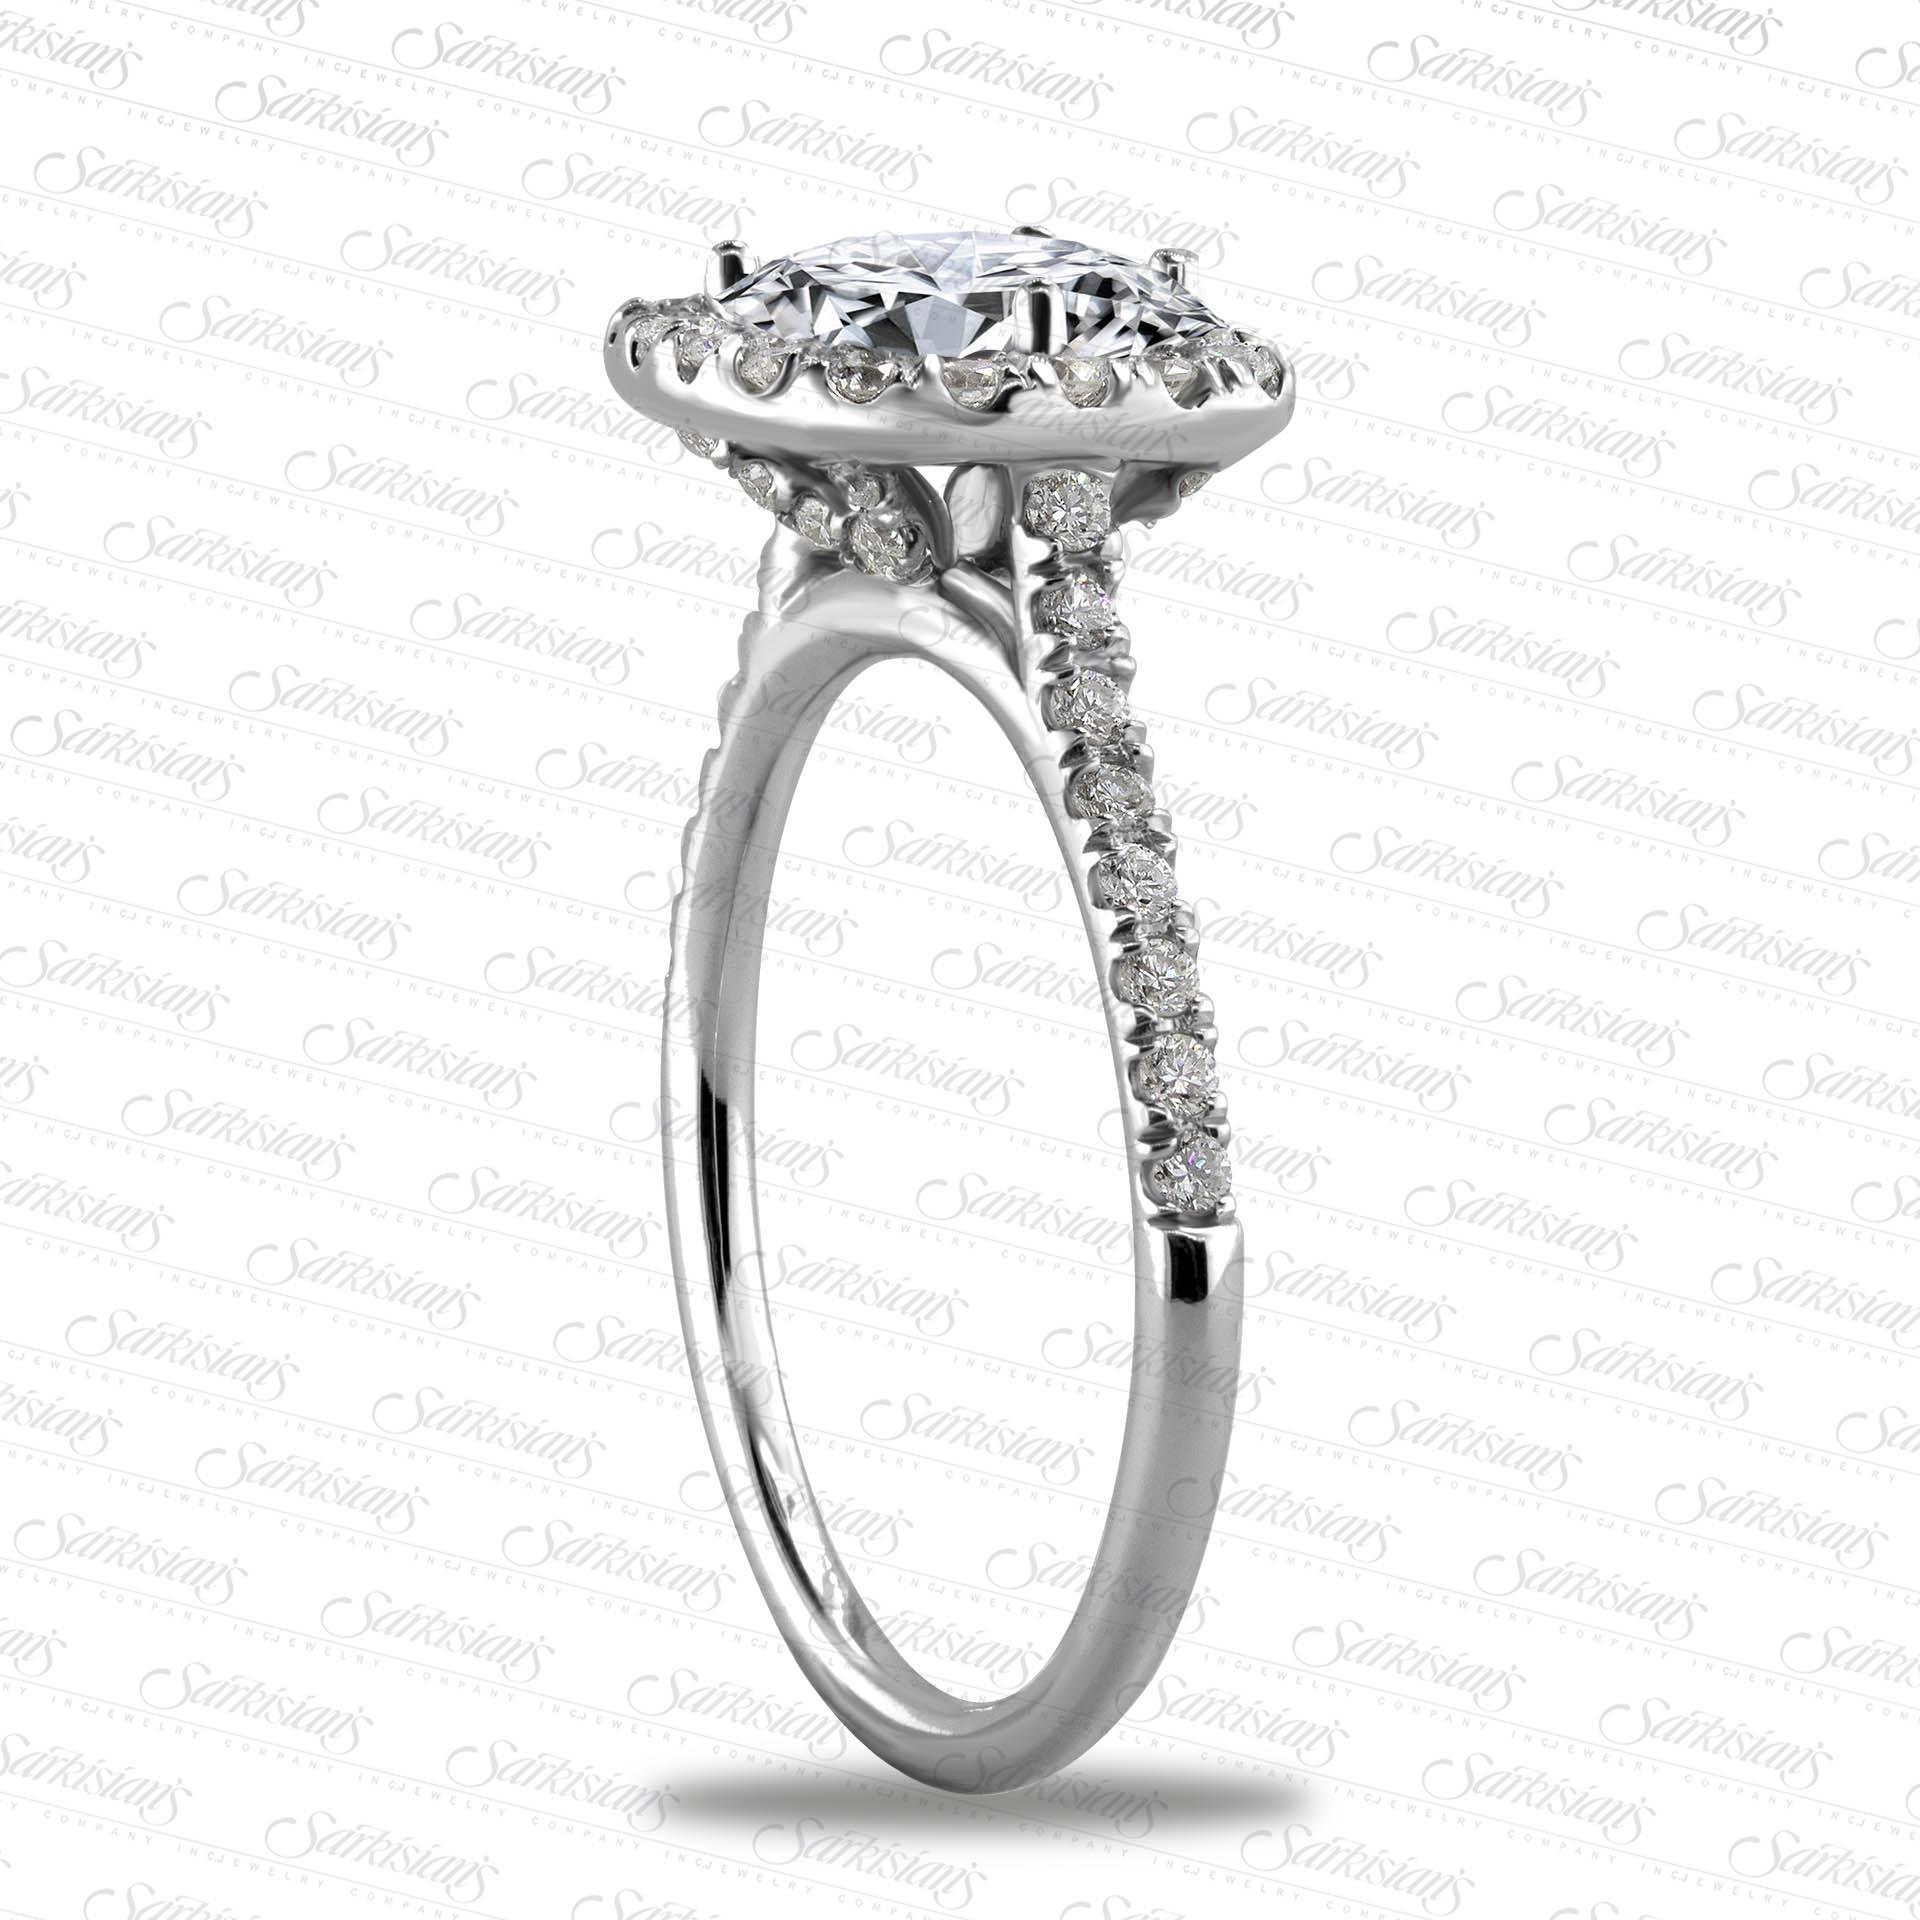 Cushion Halo Diamond Engagement Ring Gold Or Platinum